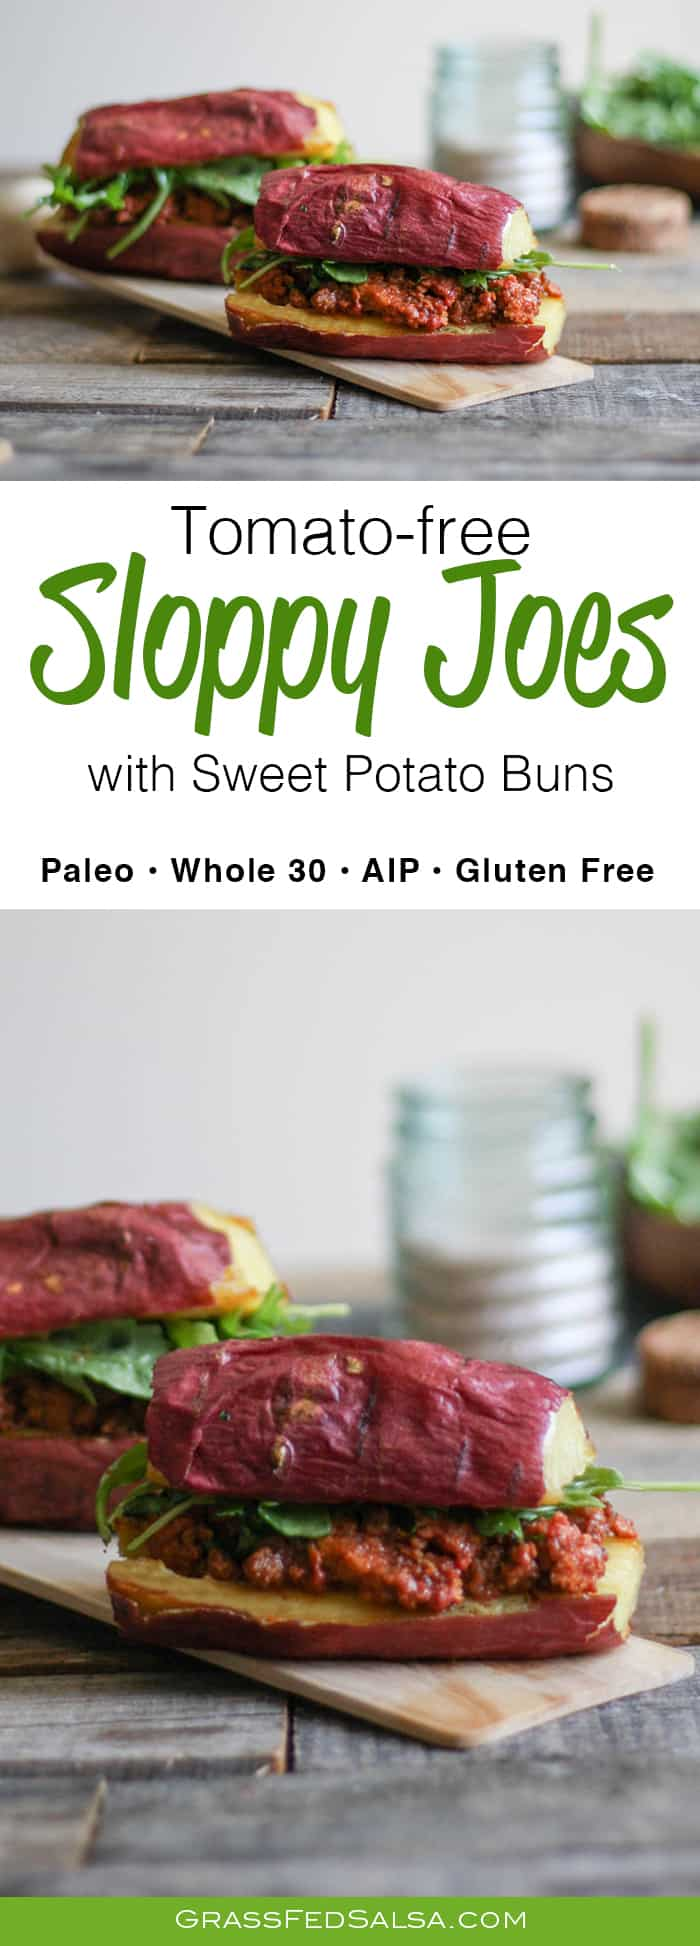 Homemade Tomato-free Sloppy Joes recipe with Sweet Potato Buns   Whole 30, Paleo, AIP, Gluten Free